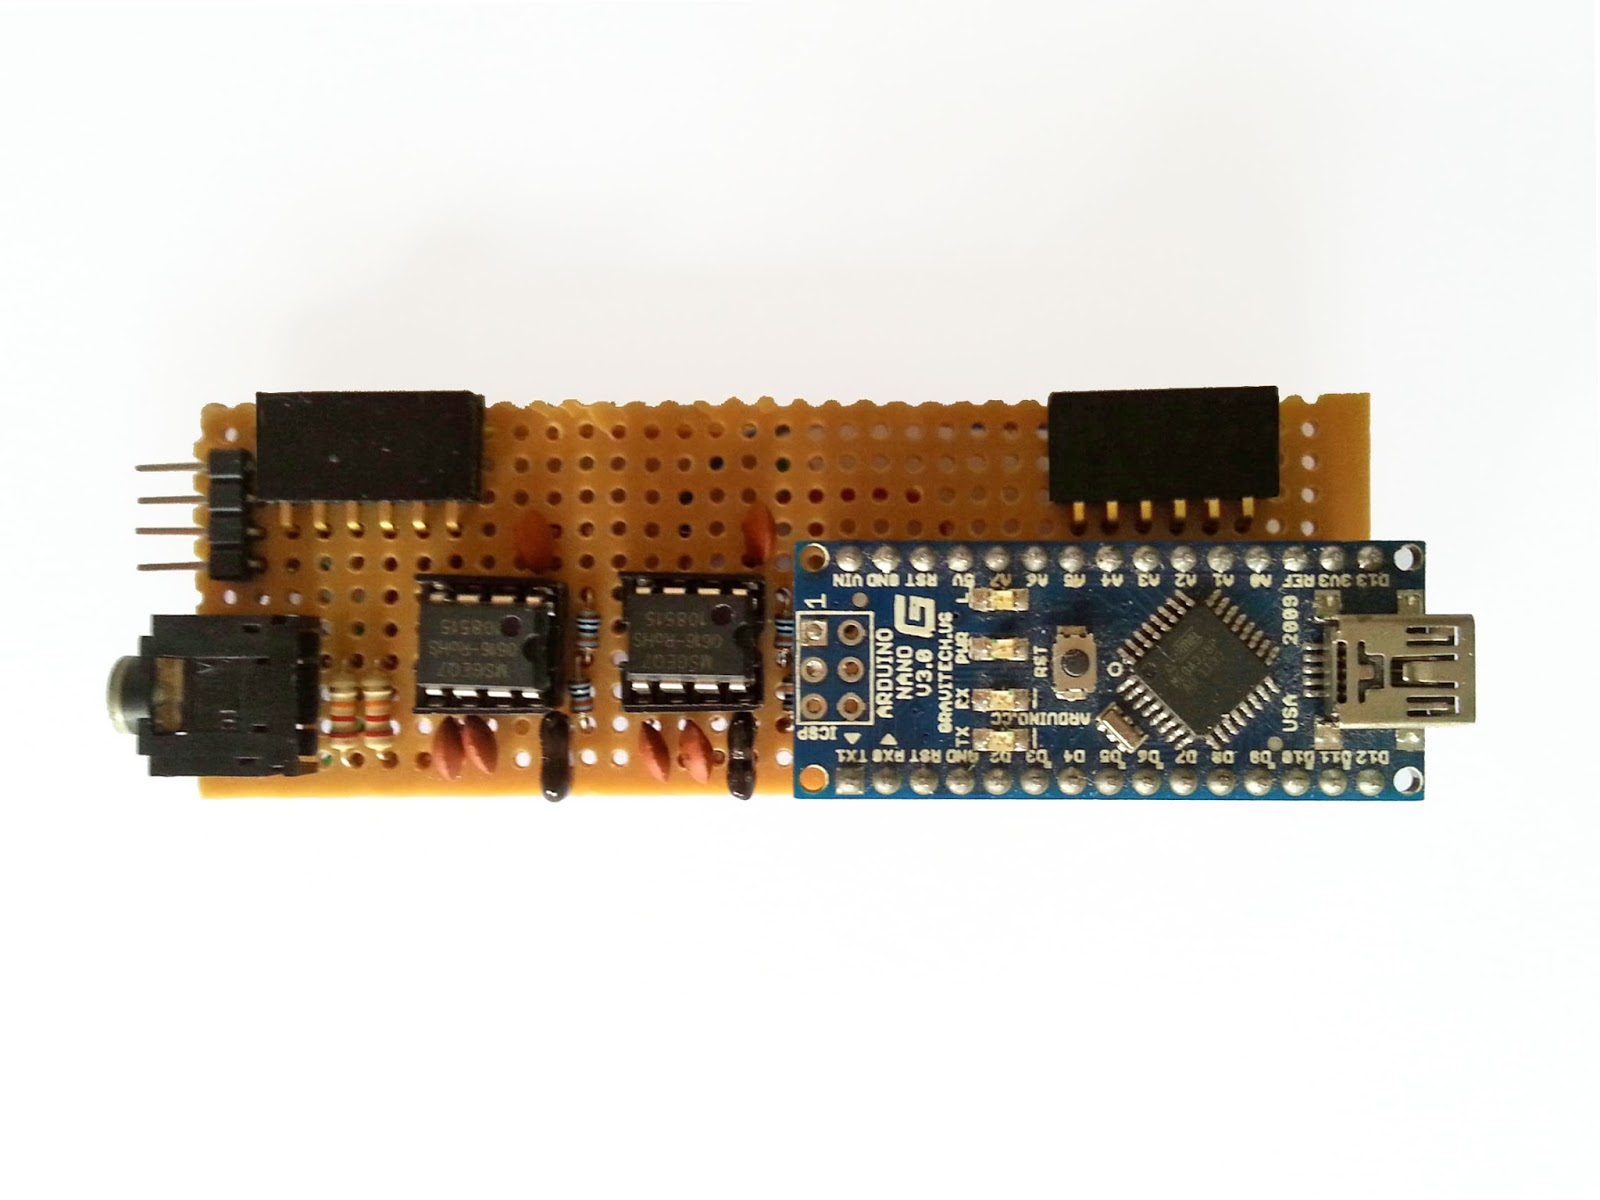 audio spectrum analyzer circuit diagram 1980 shovelhead wiring jollifactory arduino based bi color led matrix